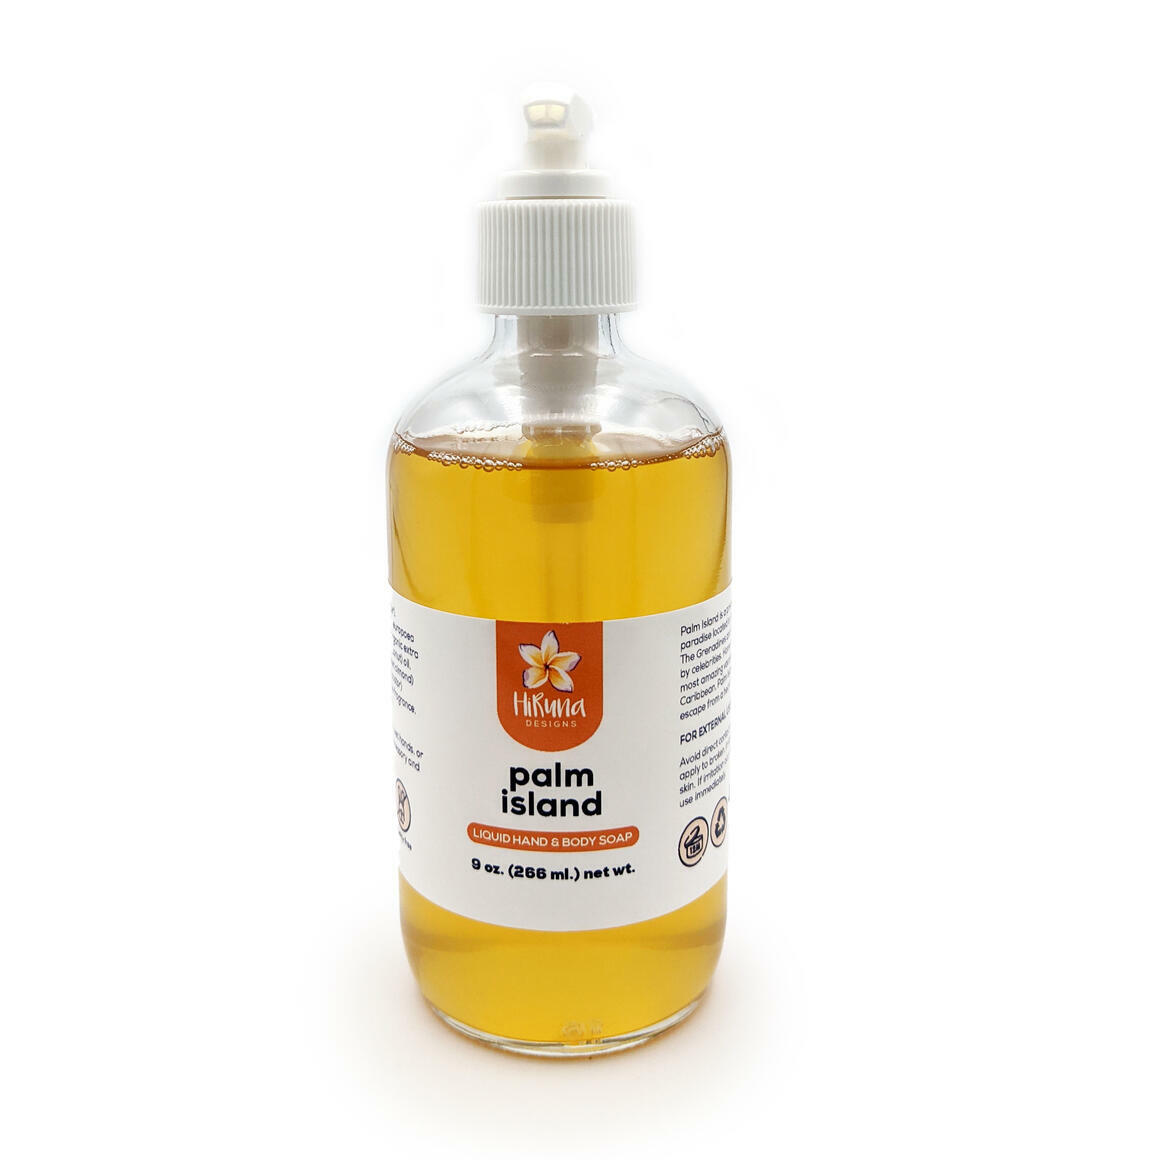 Palm Island - Liquid Hand & Body Soap | Trada Marketplace